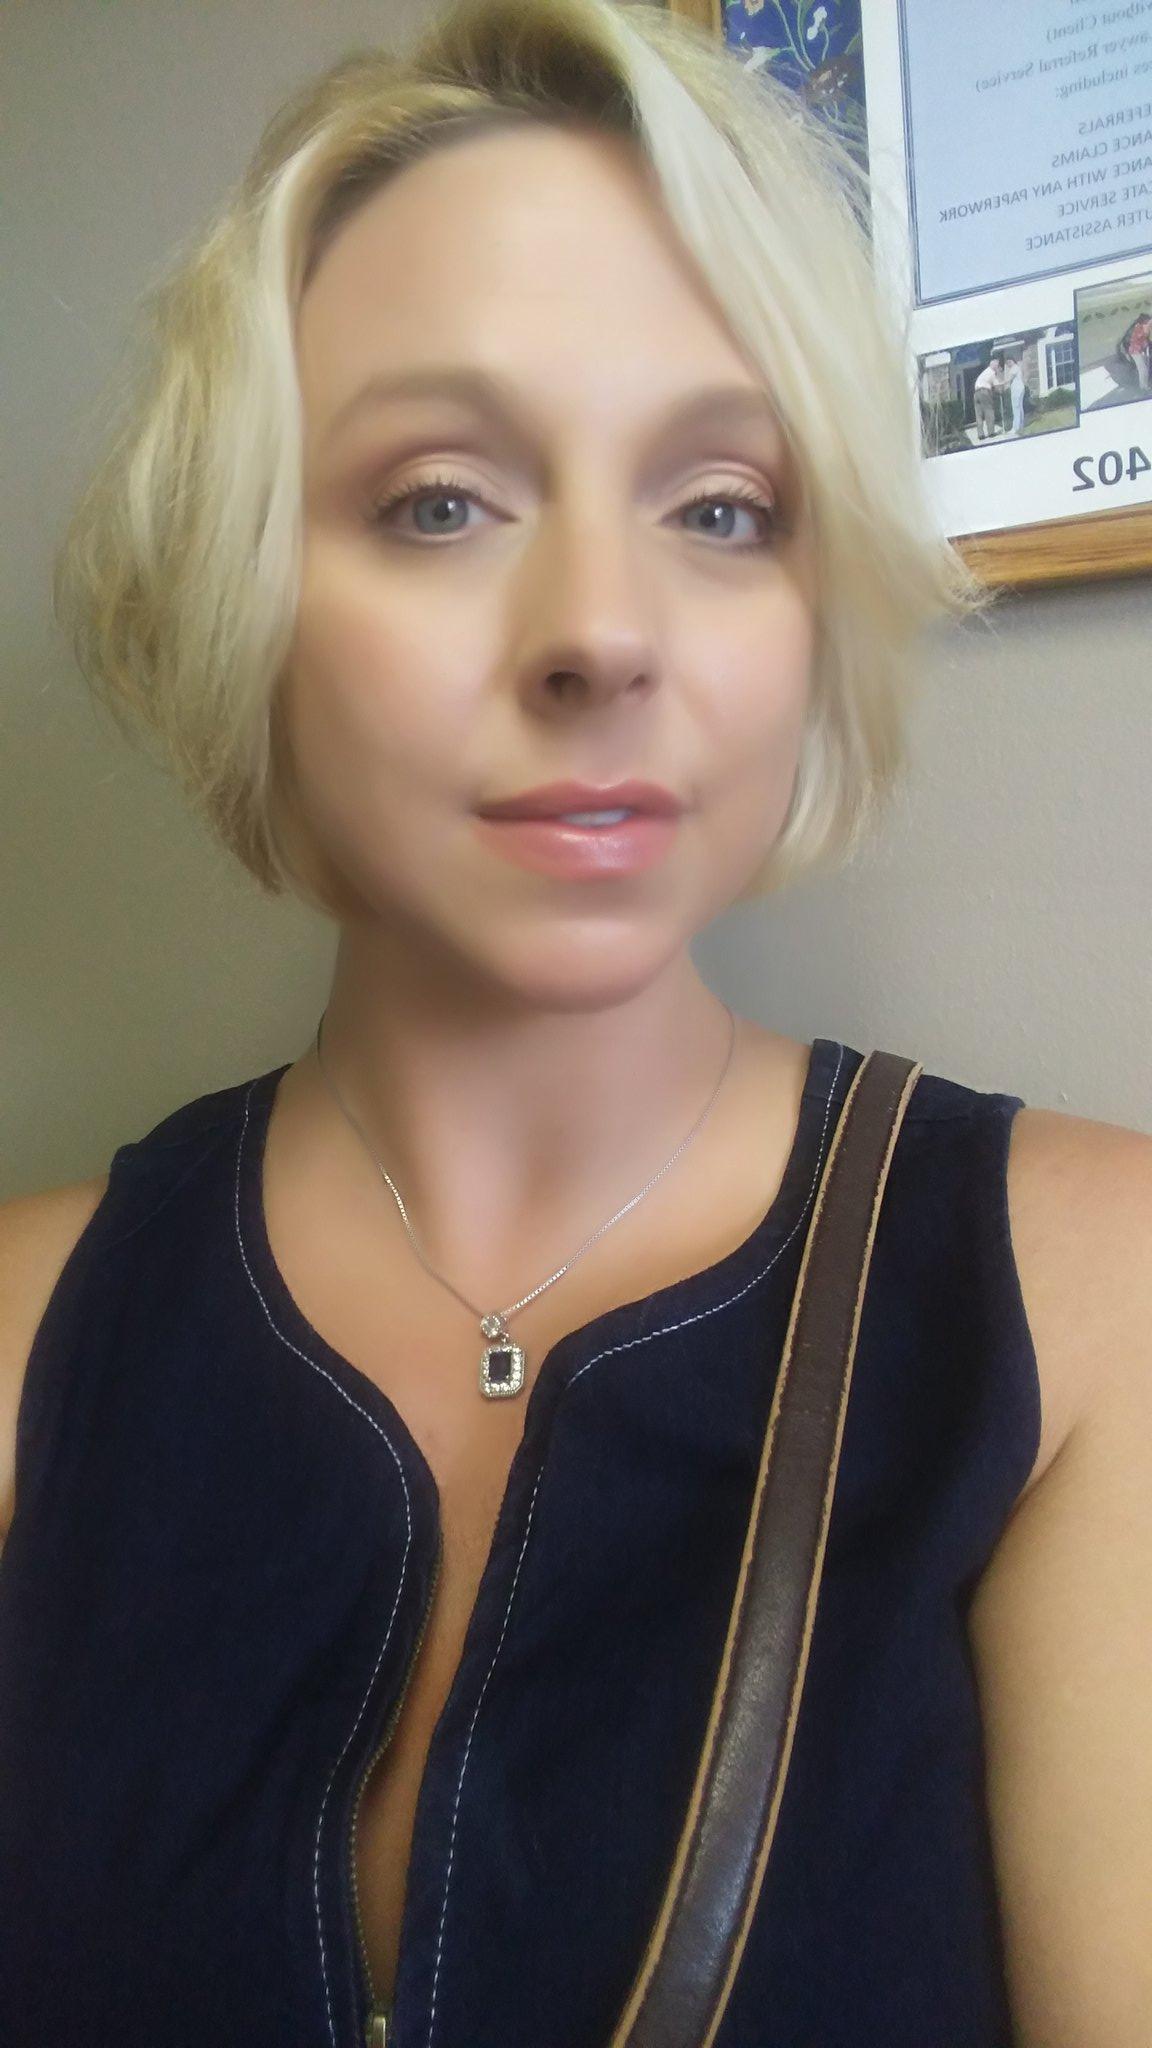 TW Pornstars - Goddess Brianna. Twitter. Im board so here